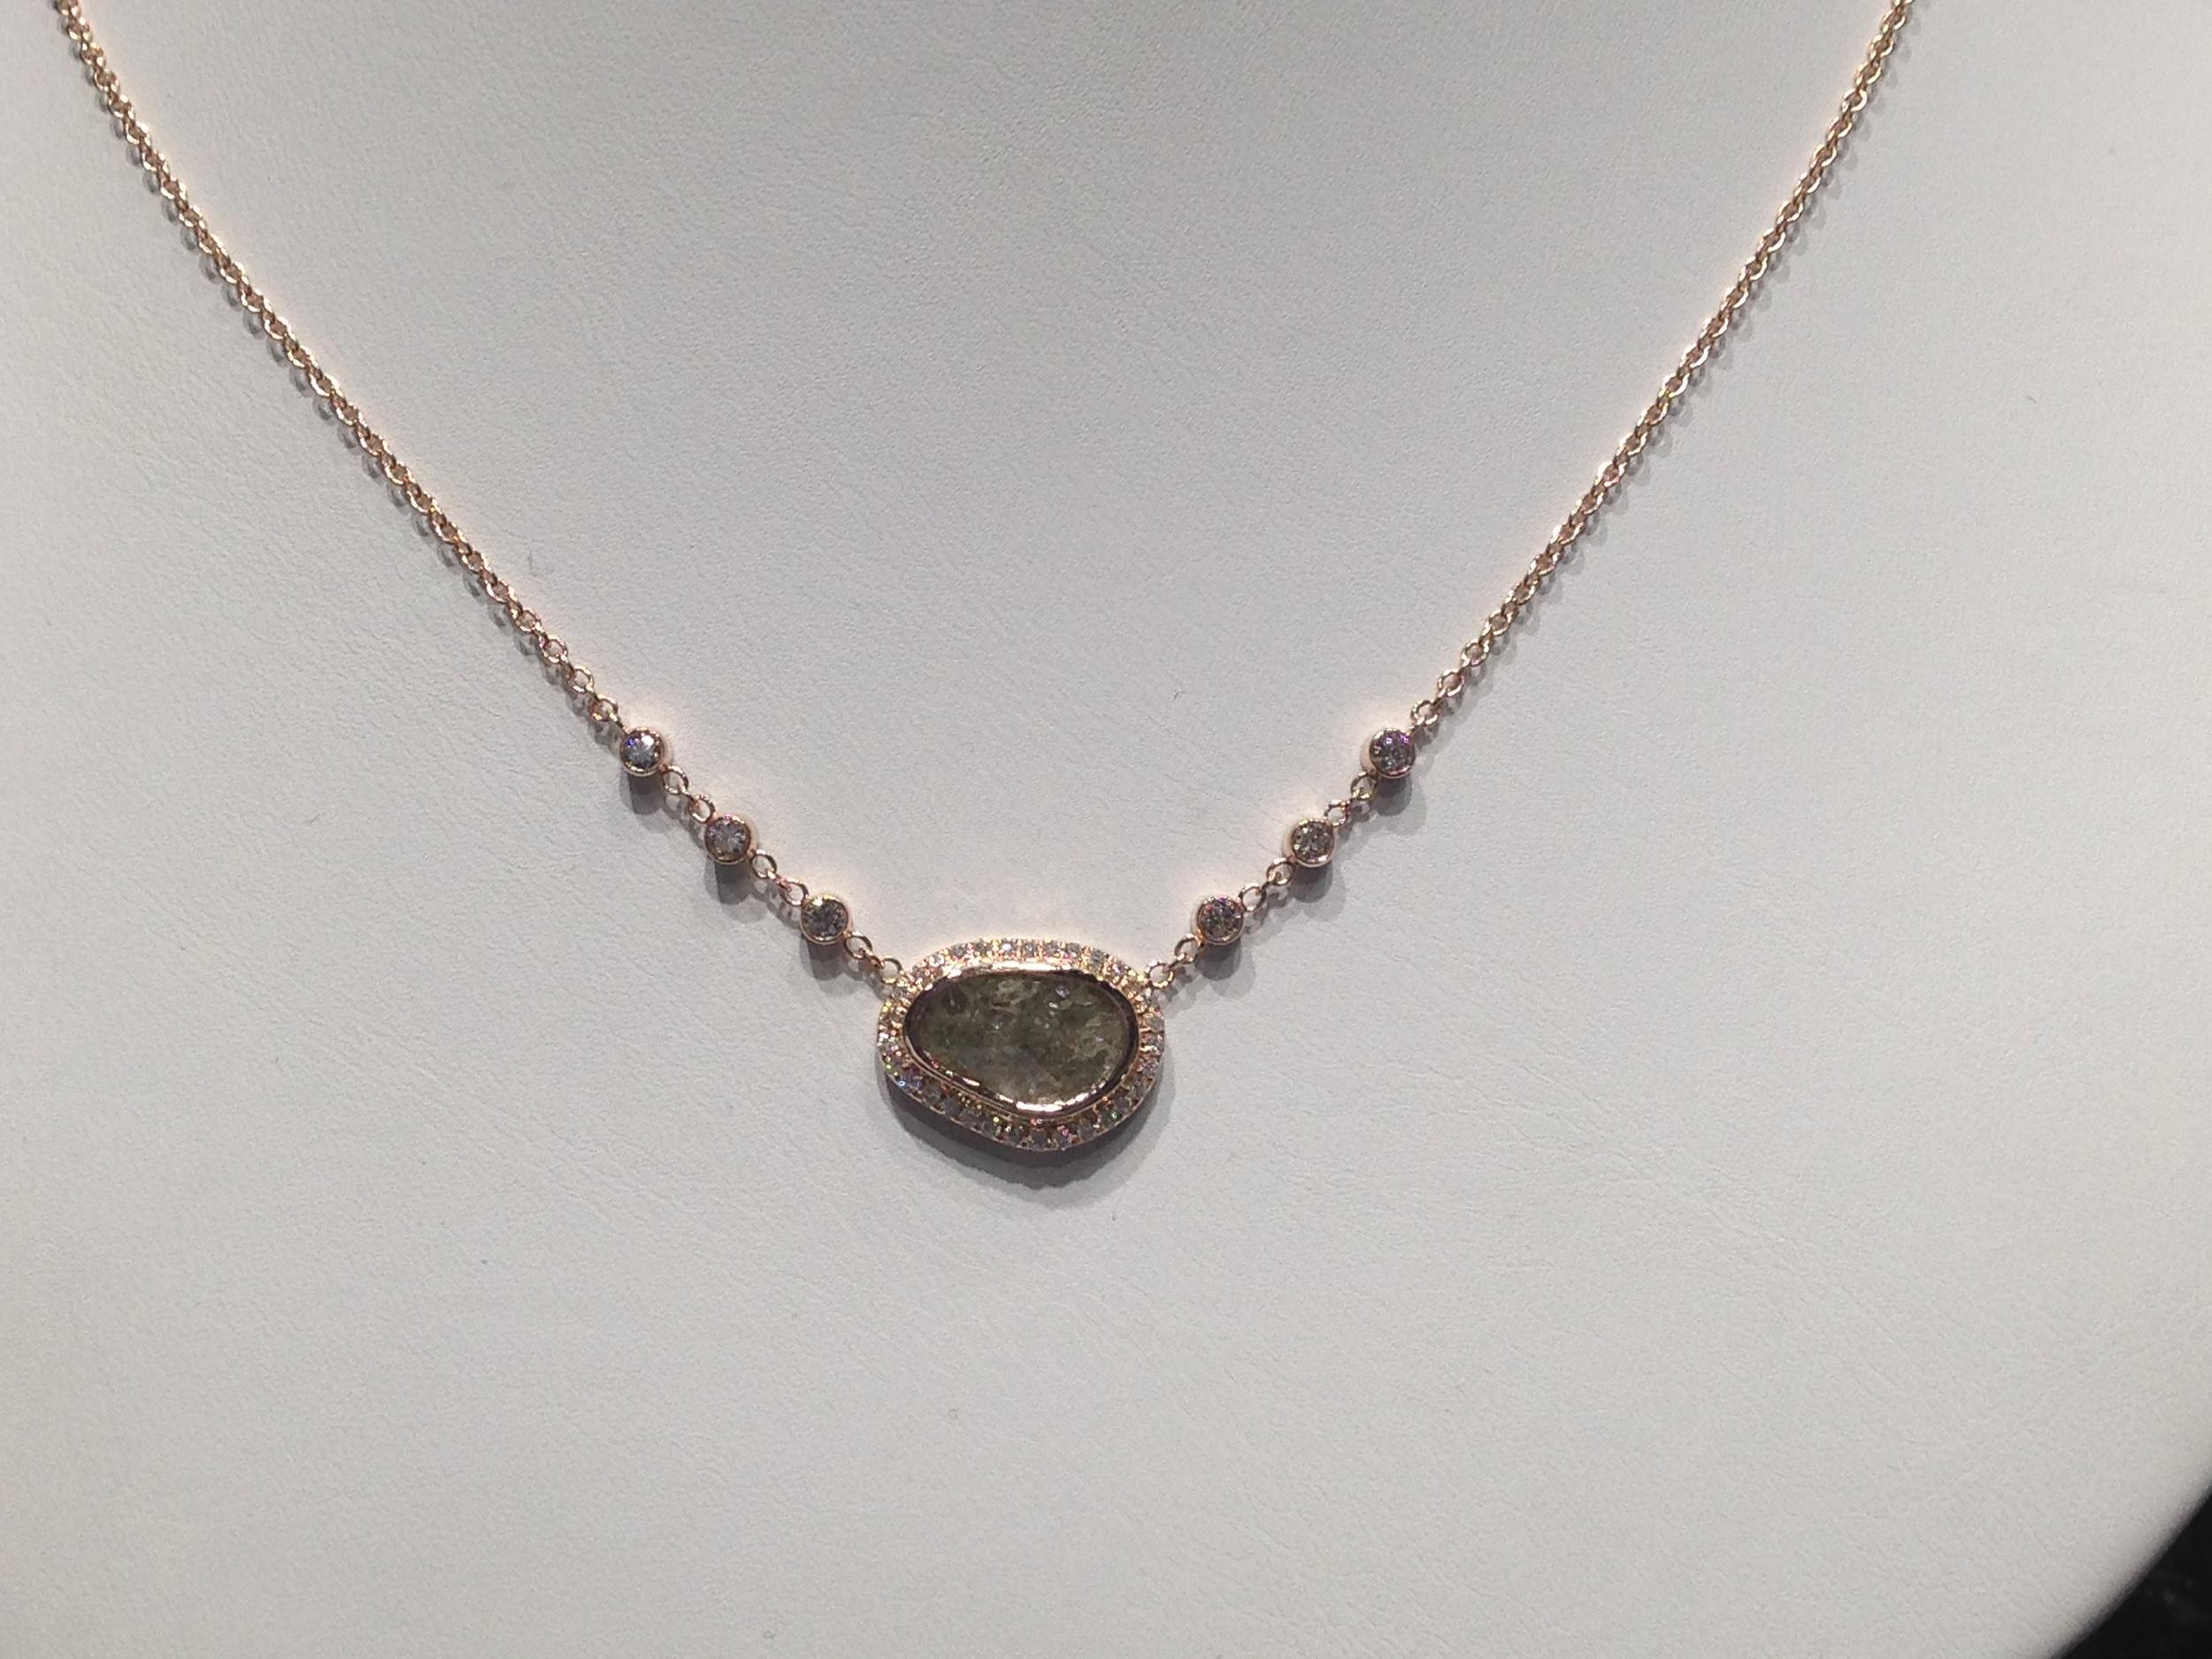 craft-revival-jewelry-store-grand-rapids-unique-rough-diamond-slice-natural-diamond-halo-pendant-rose-gold-necklace